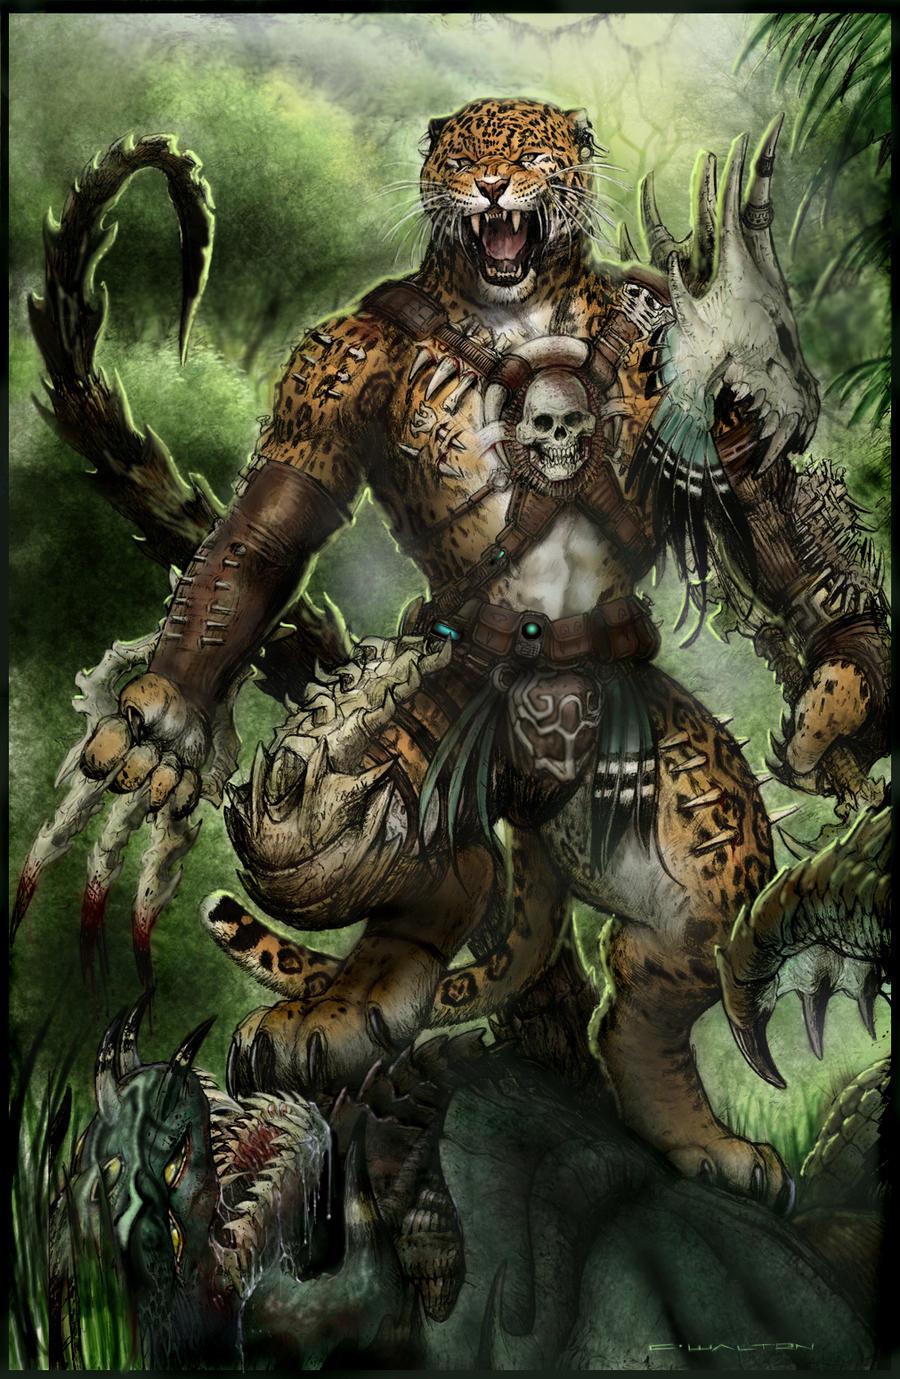 Anthro Panther Warrior Bone werejaguar path to apexby